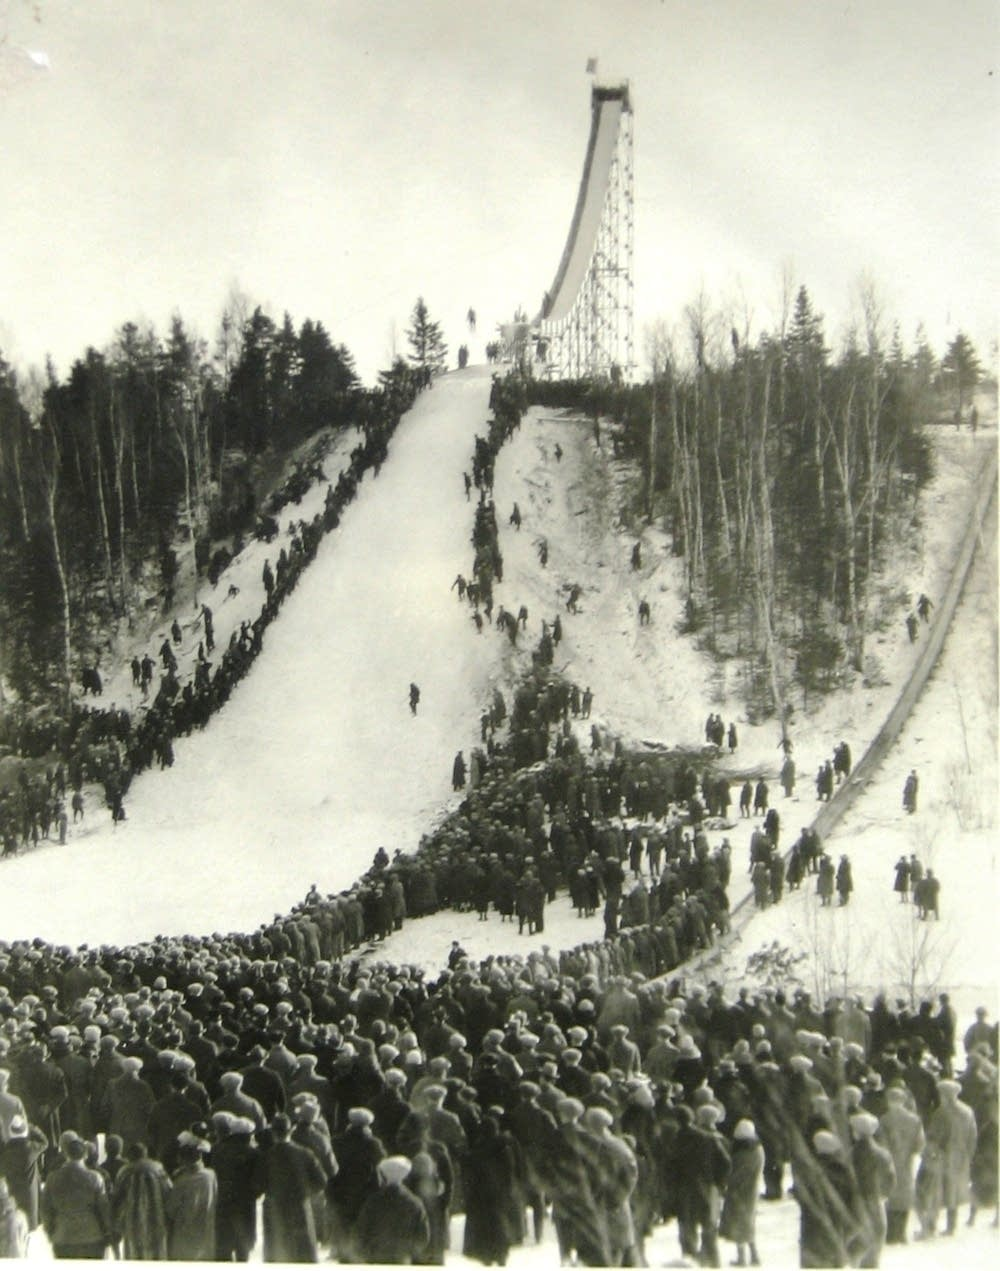 Historical Chester Bowl photo